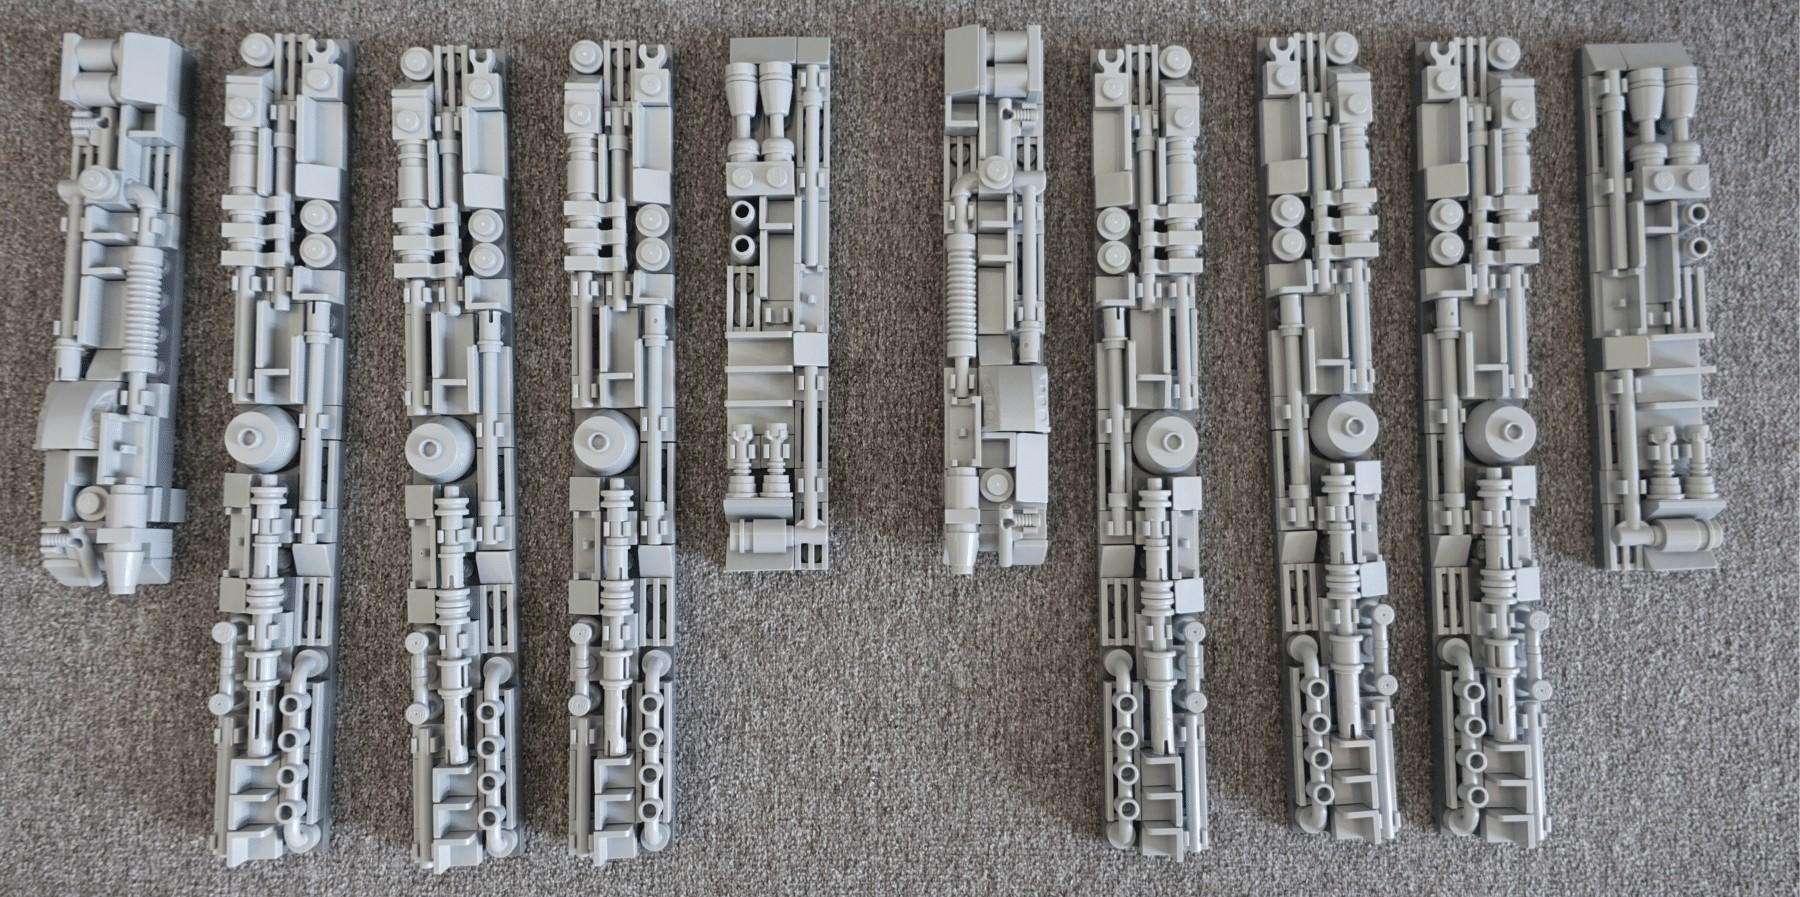 Seitenpaneele des LEGO MOC Imperial Star Destroyers